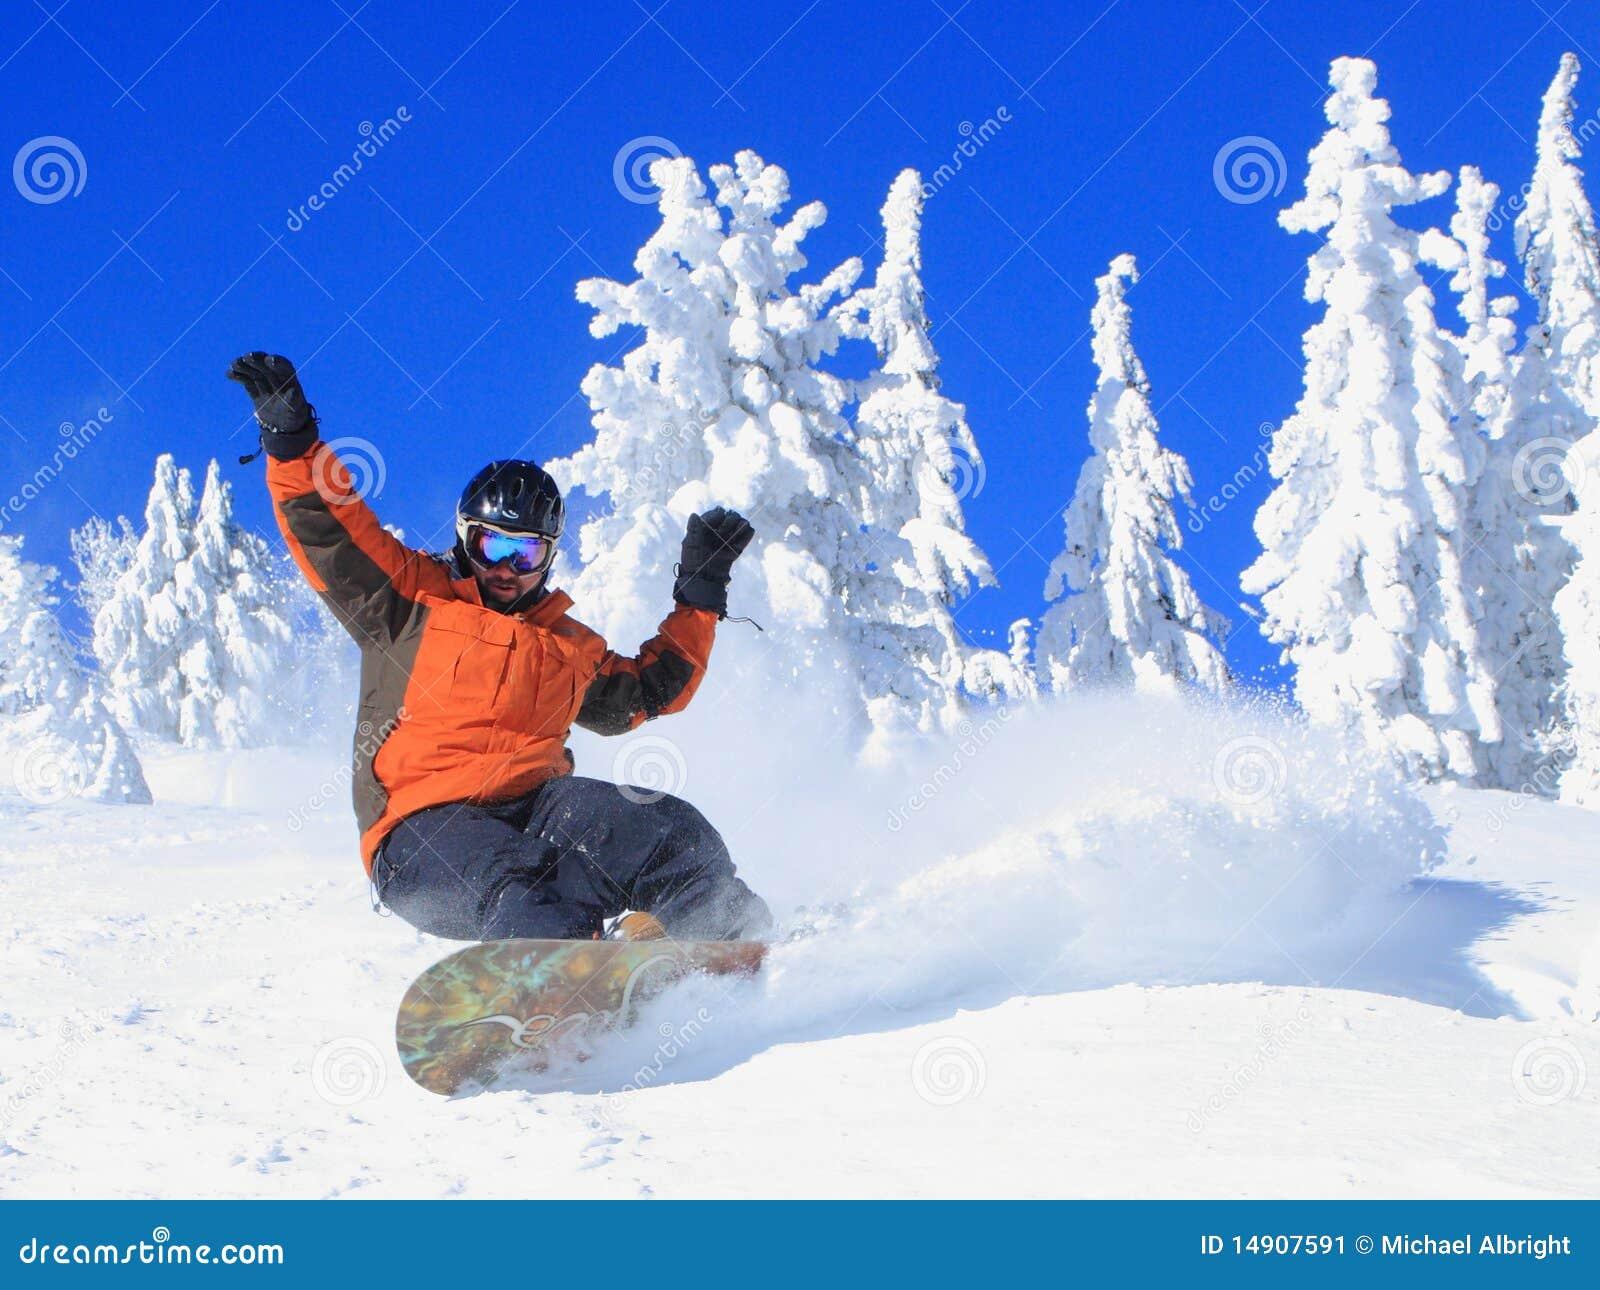 Snowboarding on a Bluebird Day